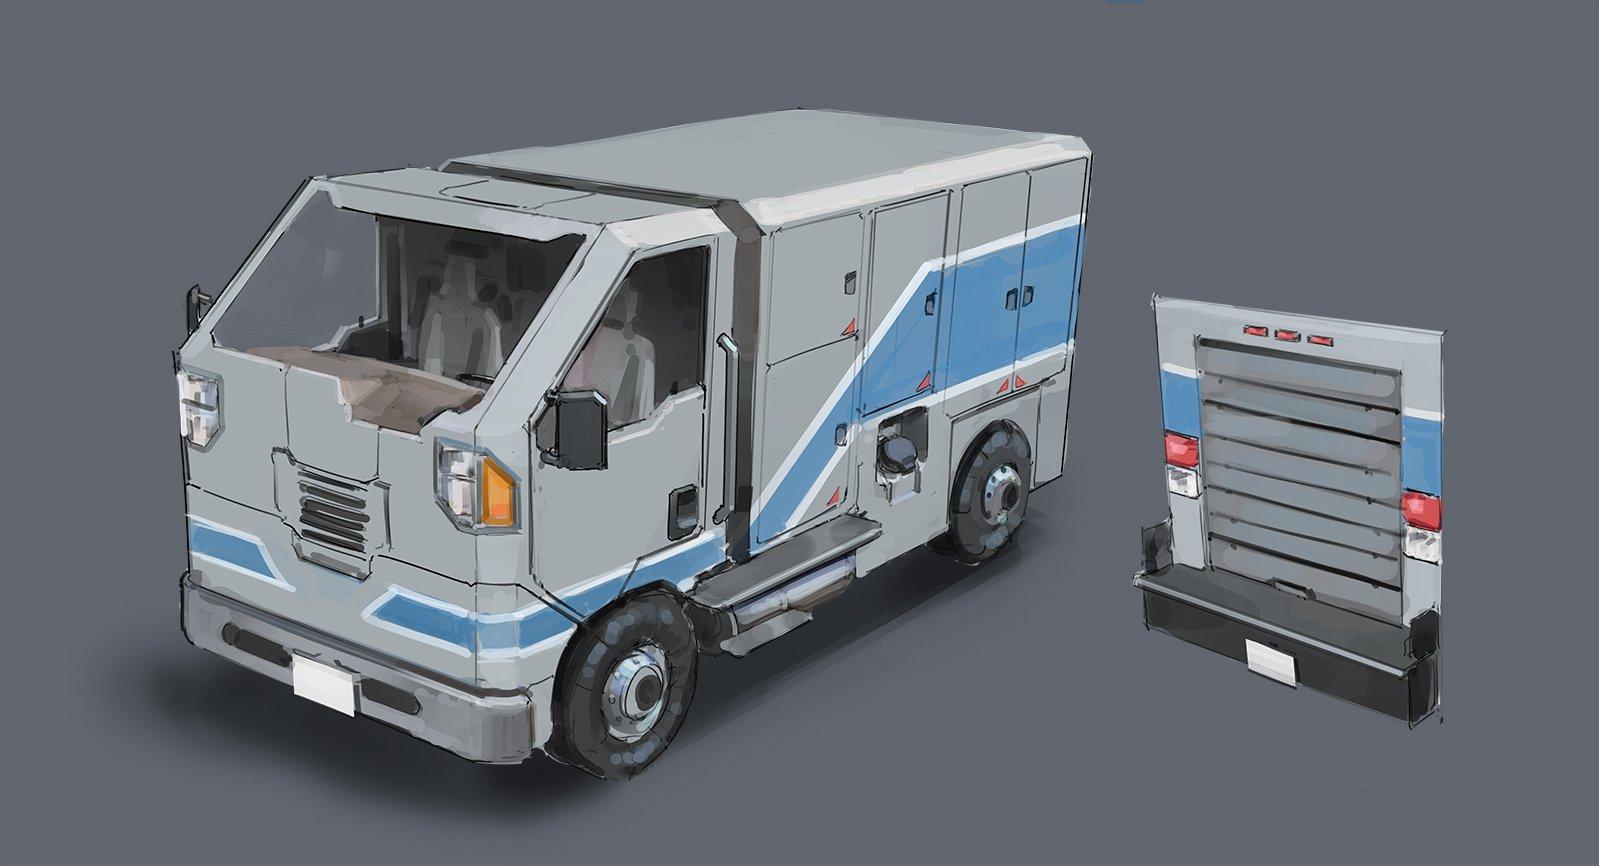 Installation 01 New Order Truck Concept Art by Aviixe (Stephen Boe)